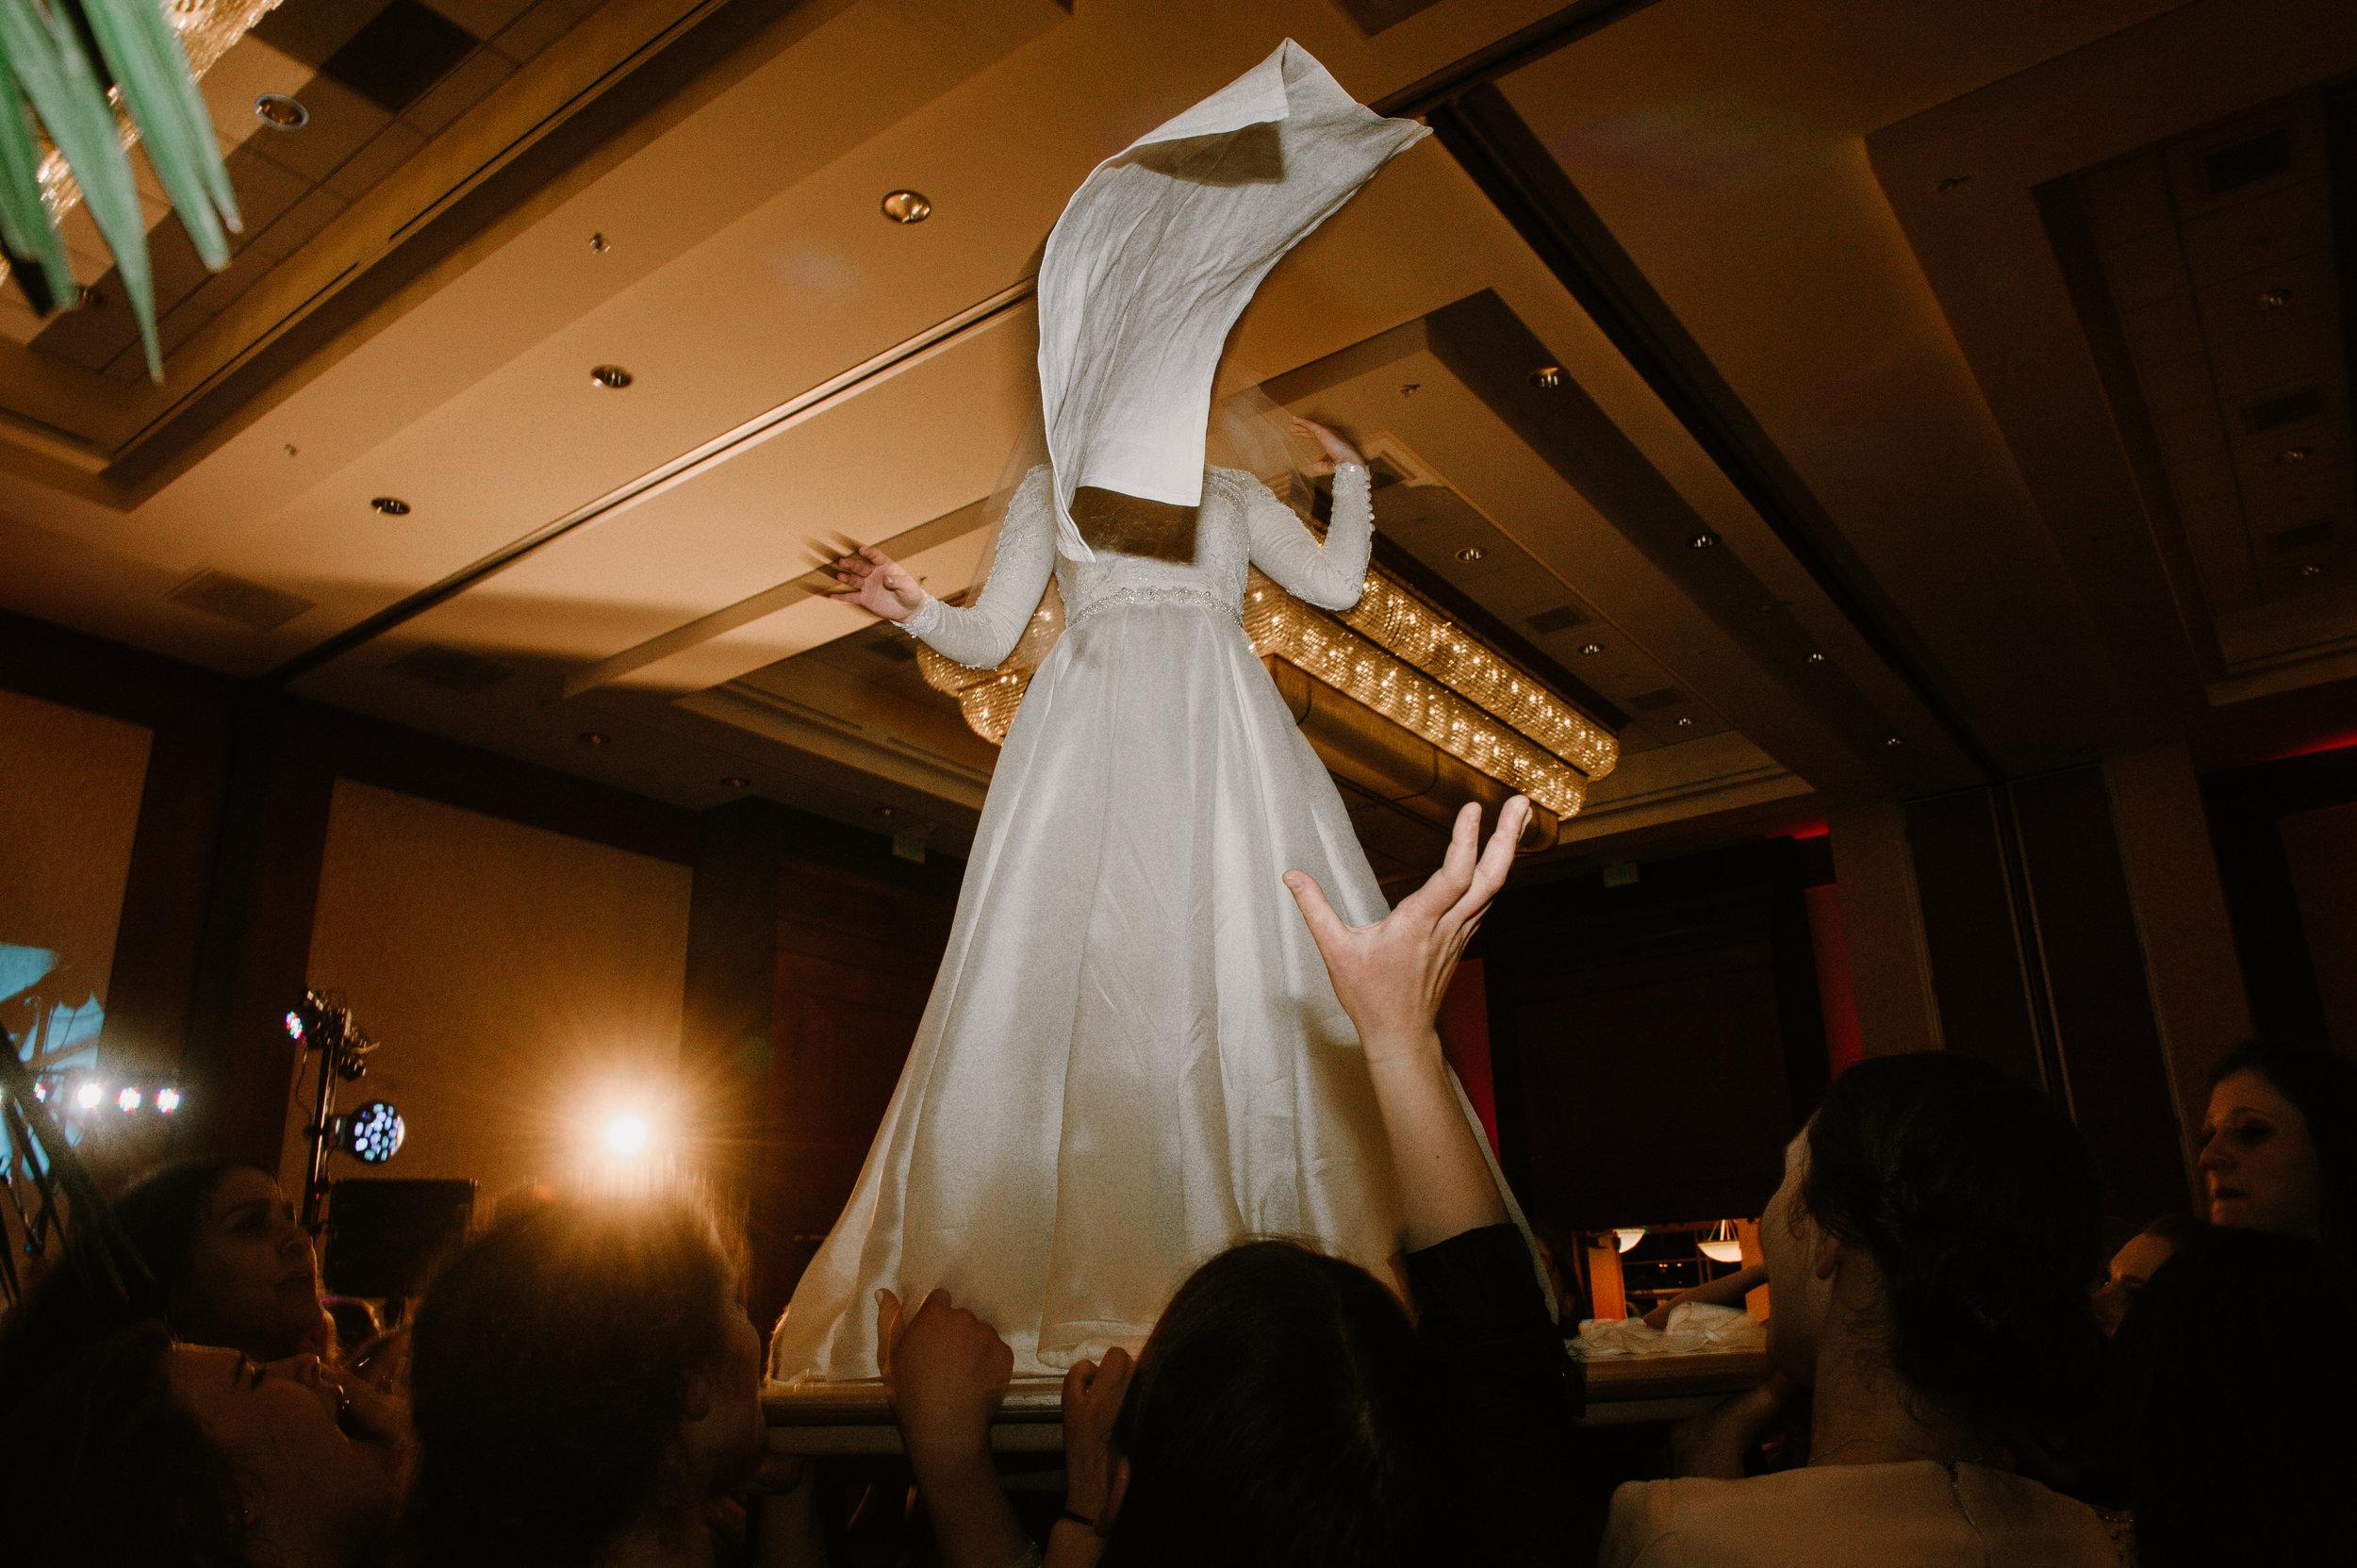 KRISTEN MARIE PARKER PRESETS WITH DVLOP — Kristen Marie